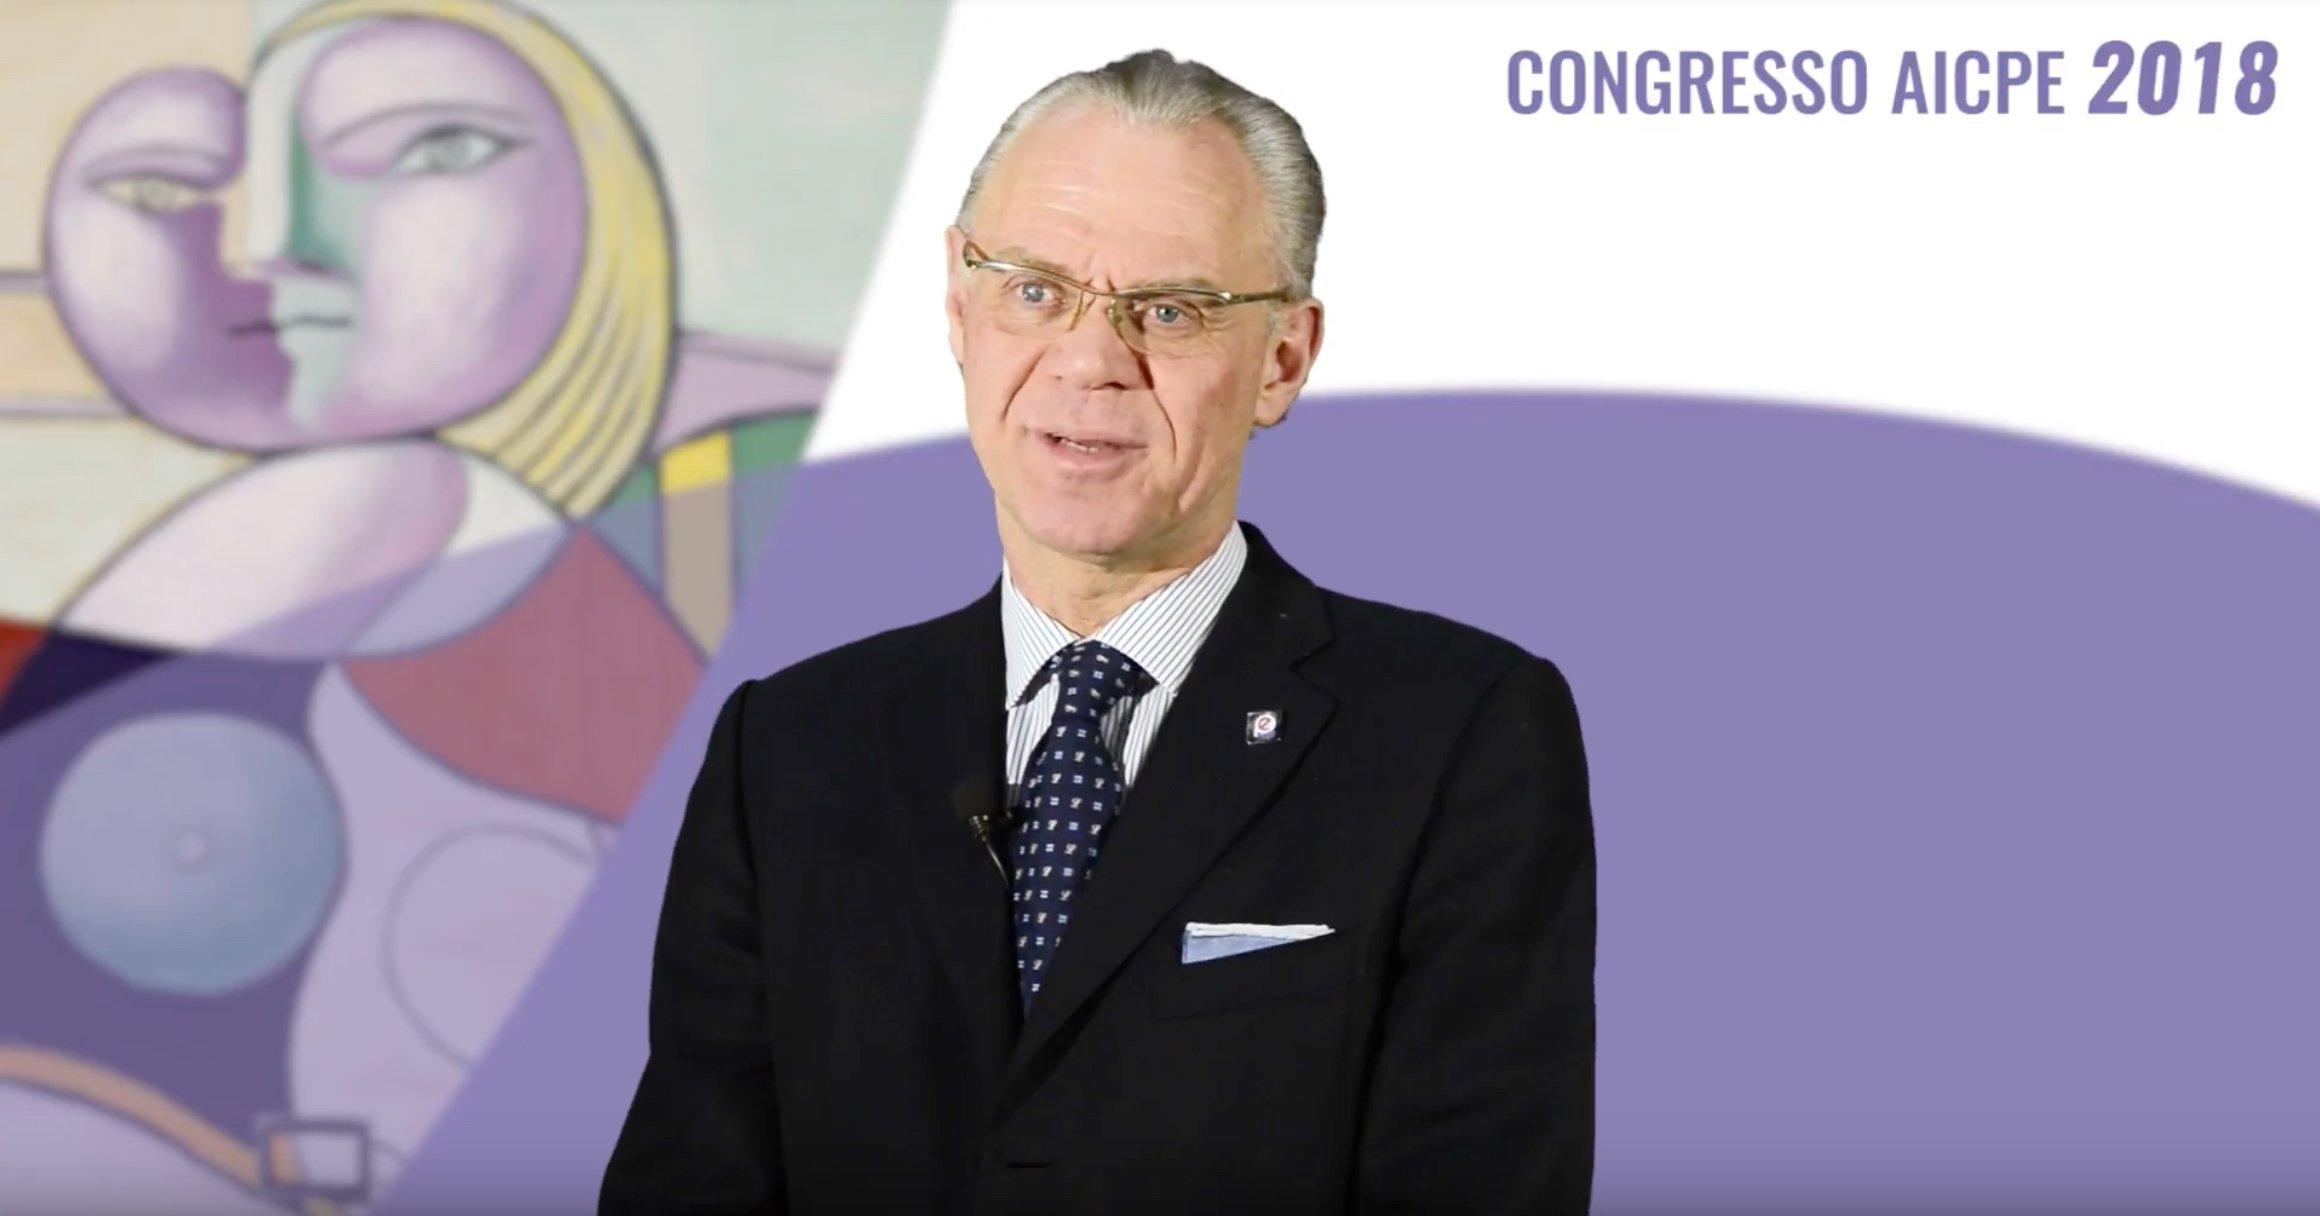 AICPE - Saluto del Past President Eugenio Gandolfi